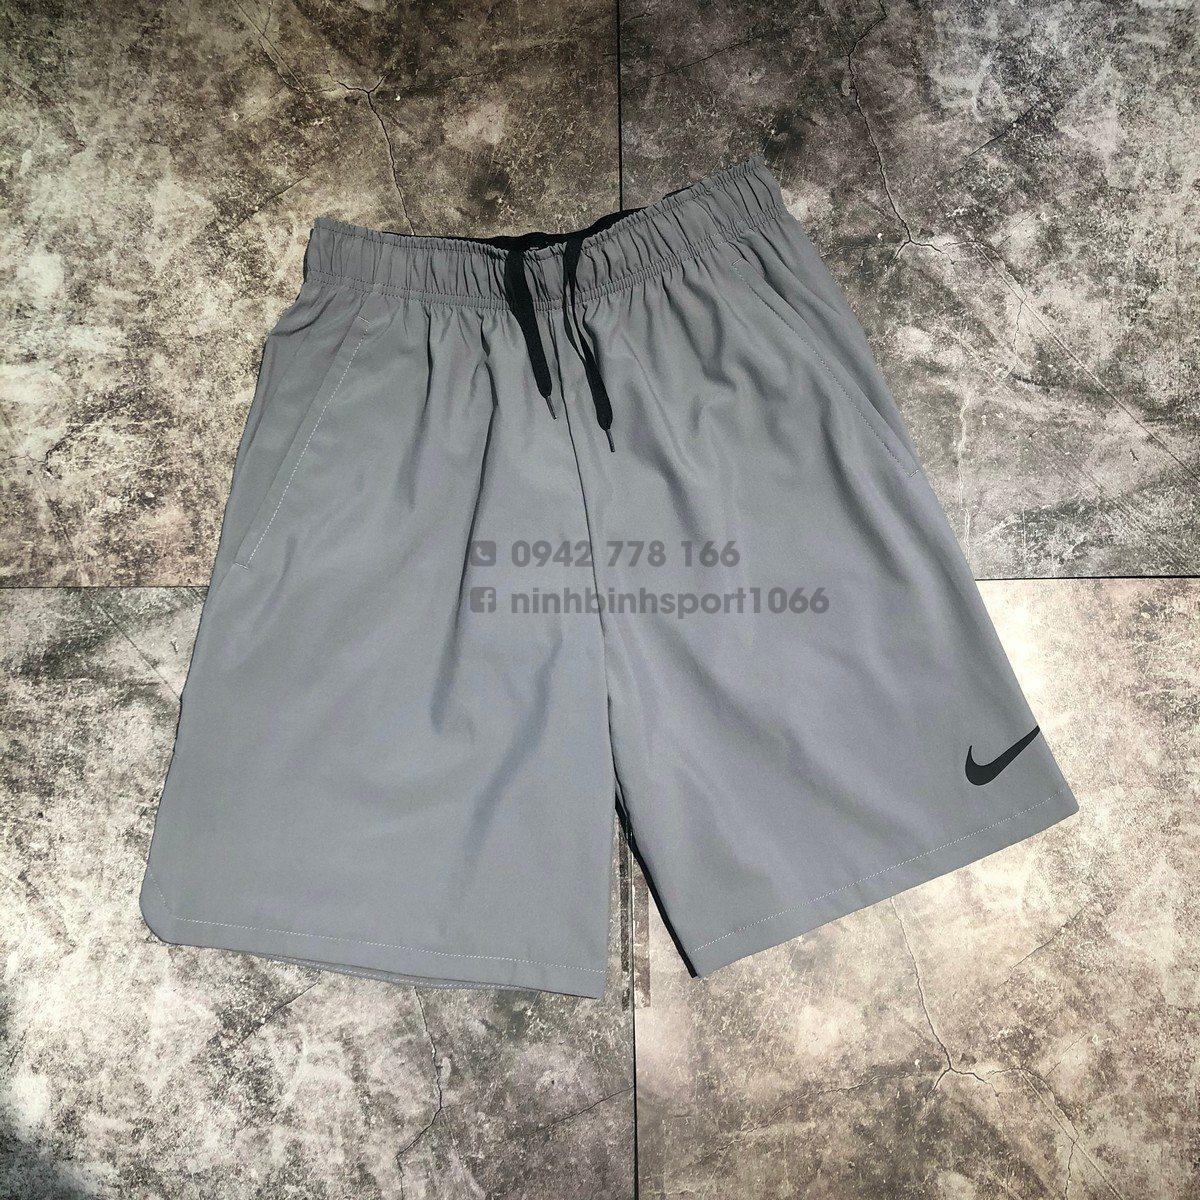 Quần thể thao nam Nike Flex Woven 2.0 927527-036